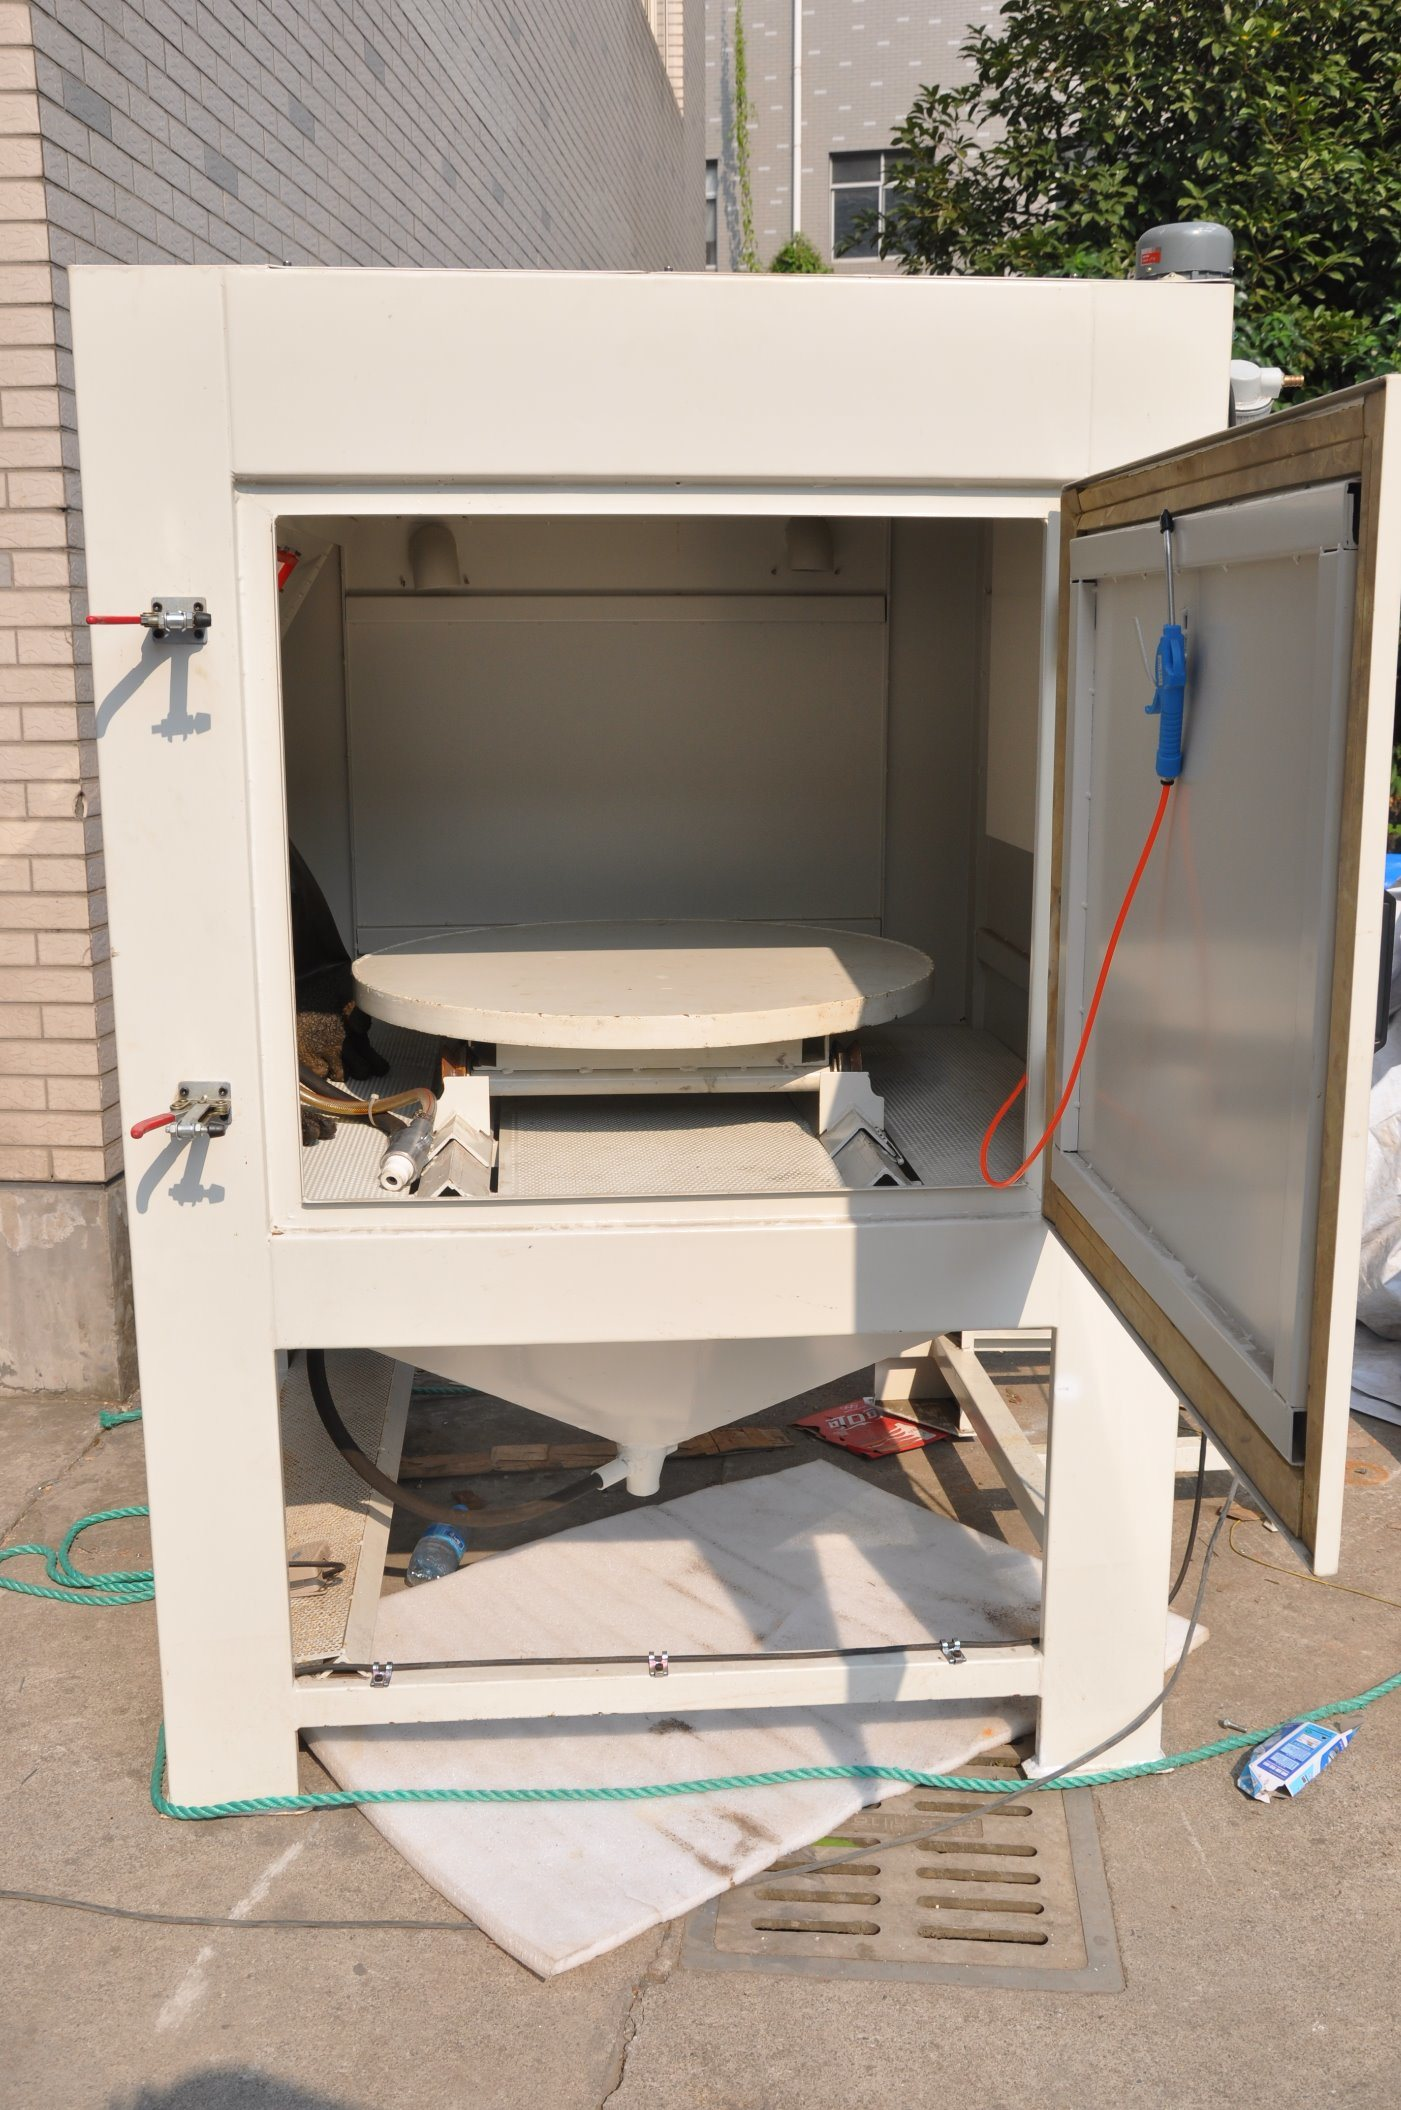 blast com oemtools amazon abrasive dp bench top sand cabinet